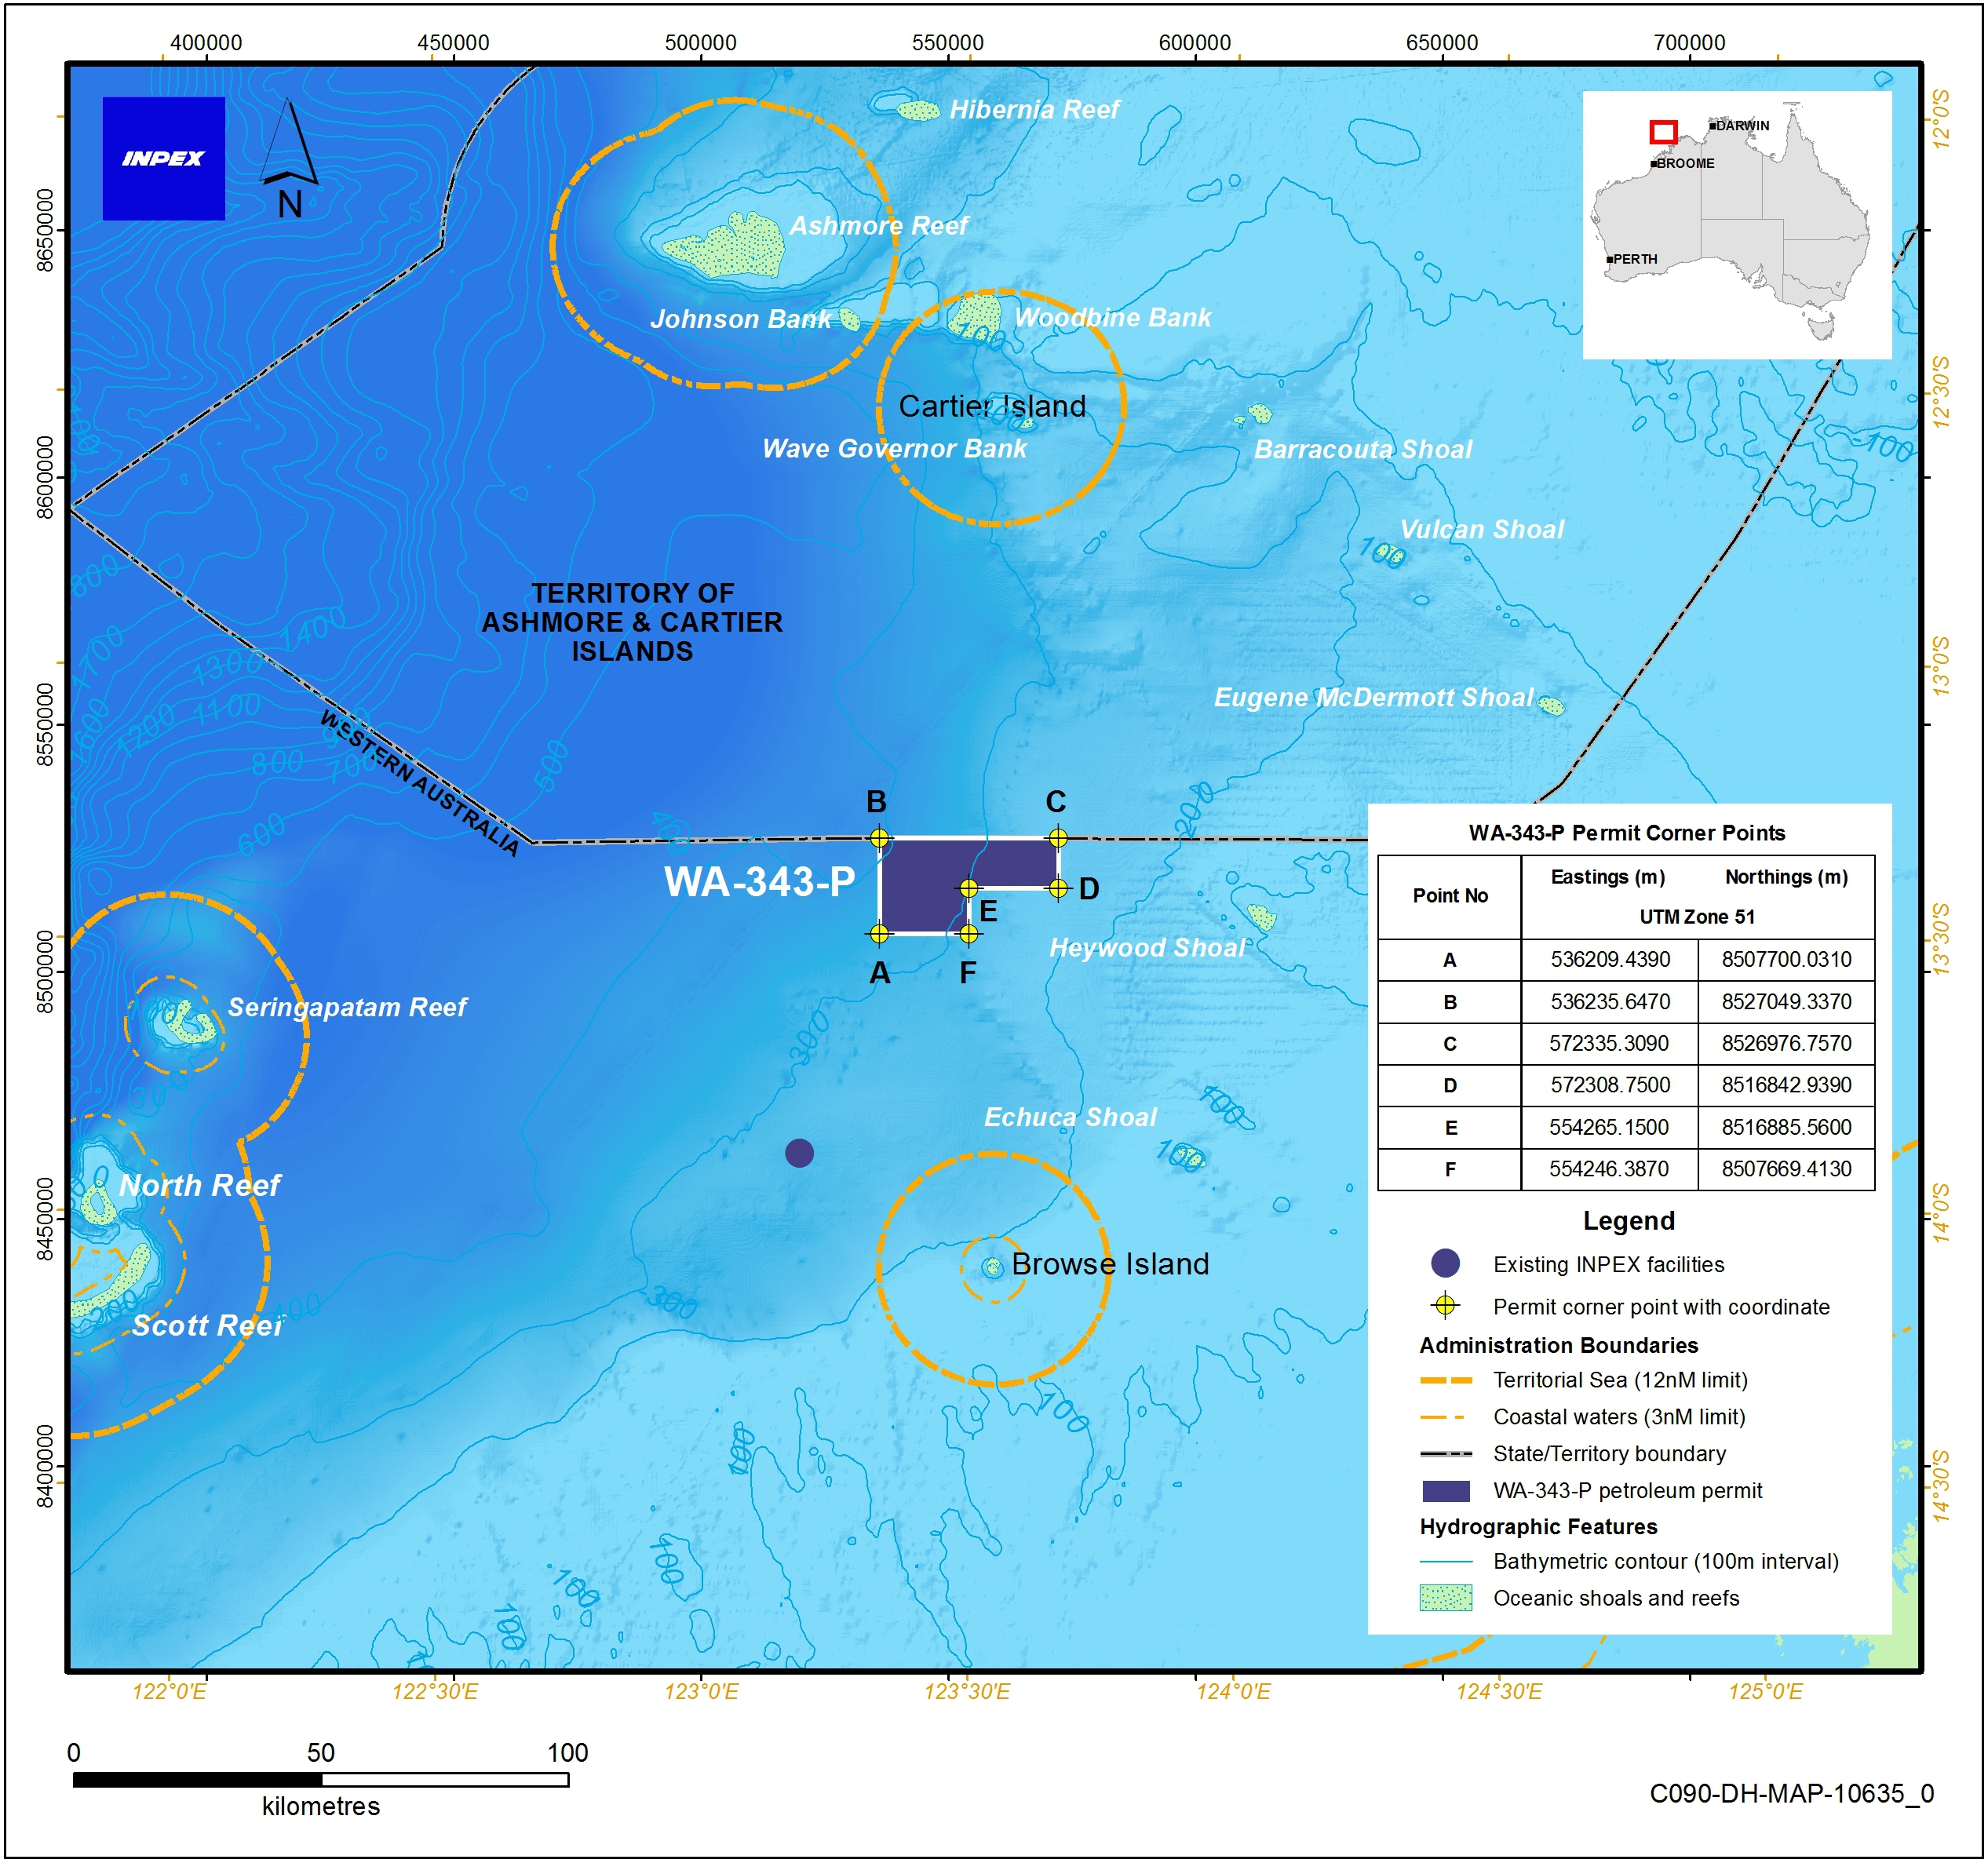 Location map - Activity: Exploration Drilling WA-343-P  (refer to description)